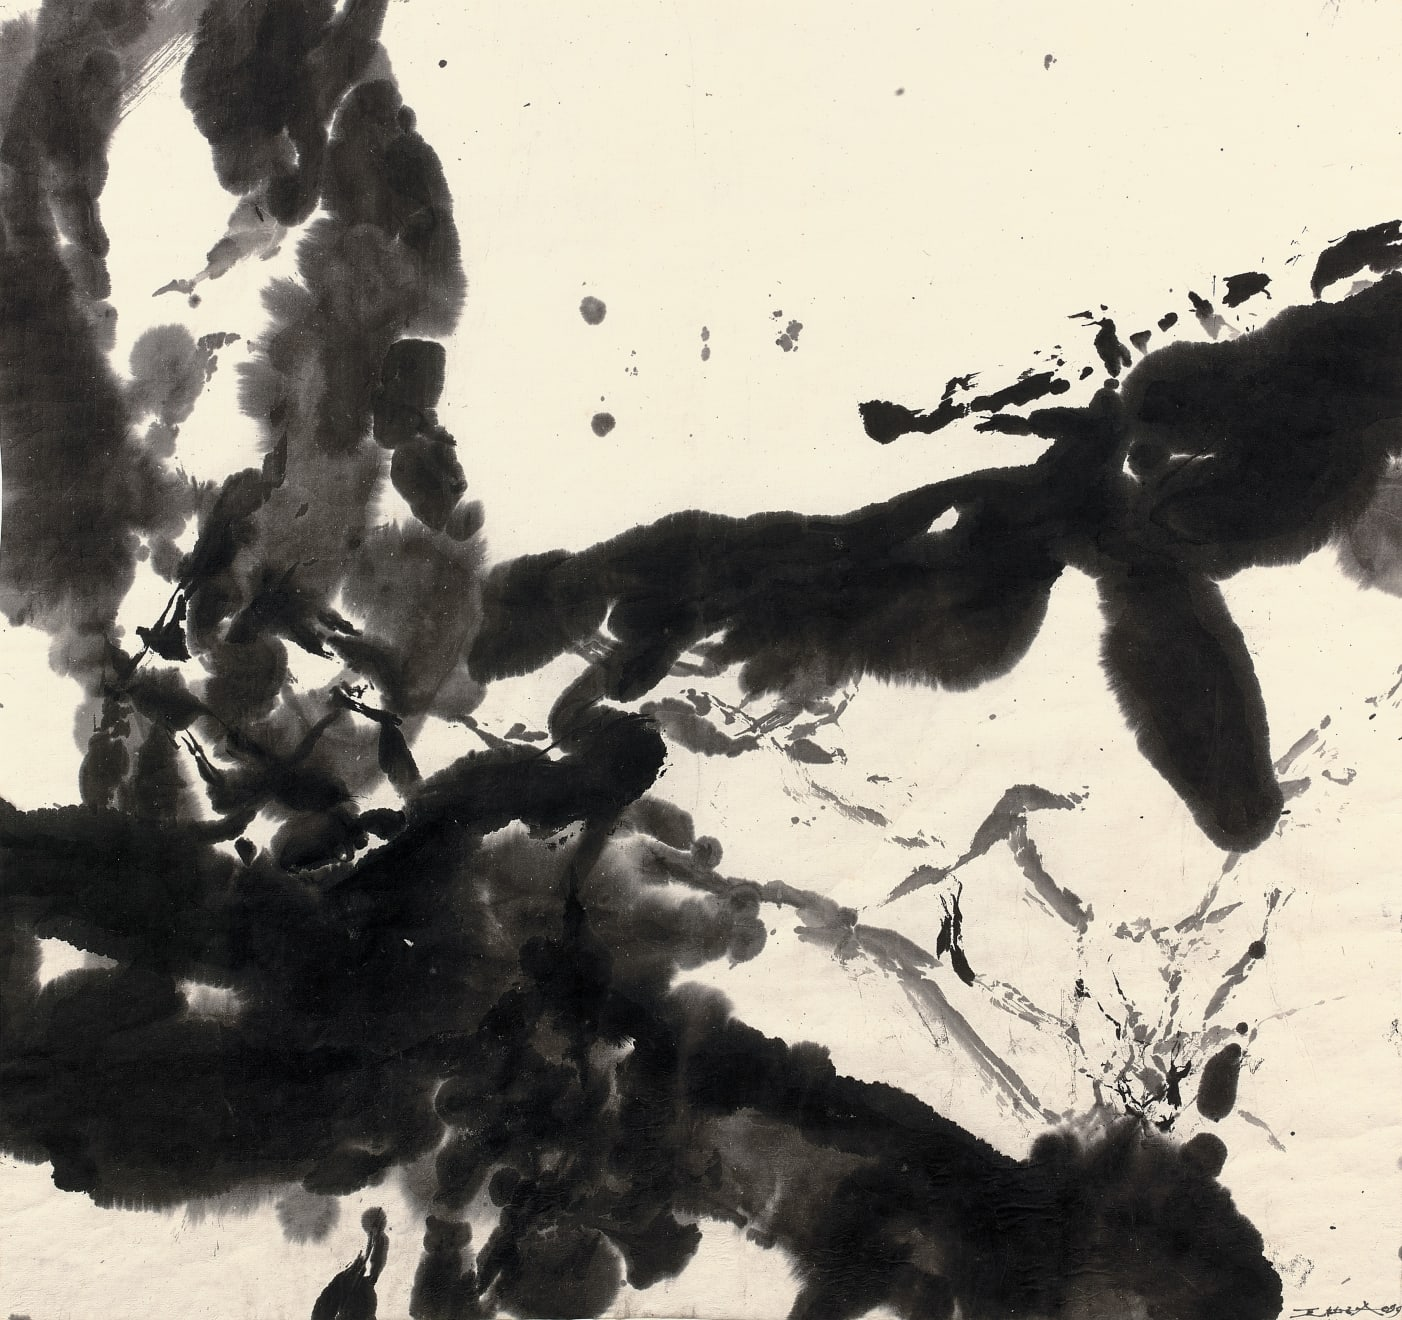 Title: Composition Artist: Zao Wou-Ki